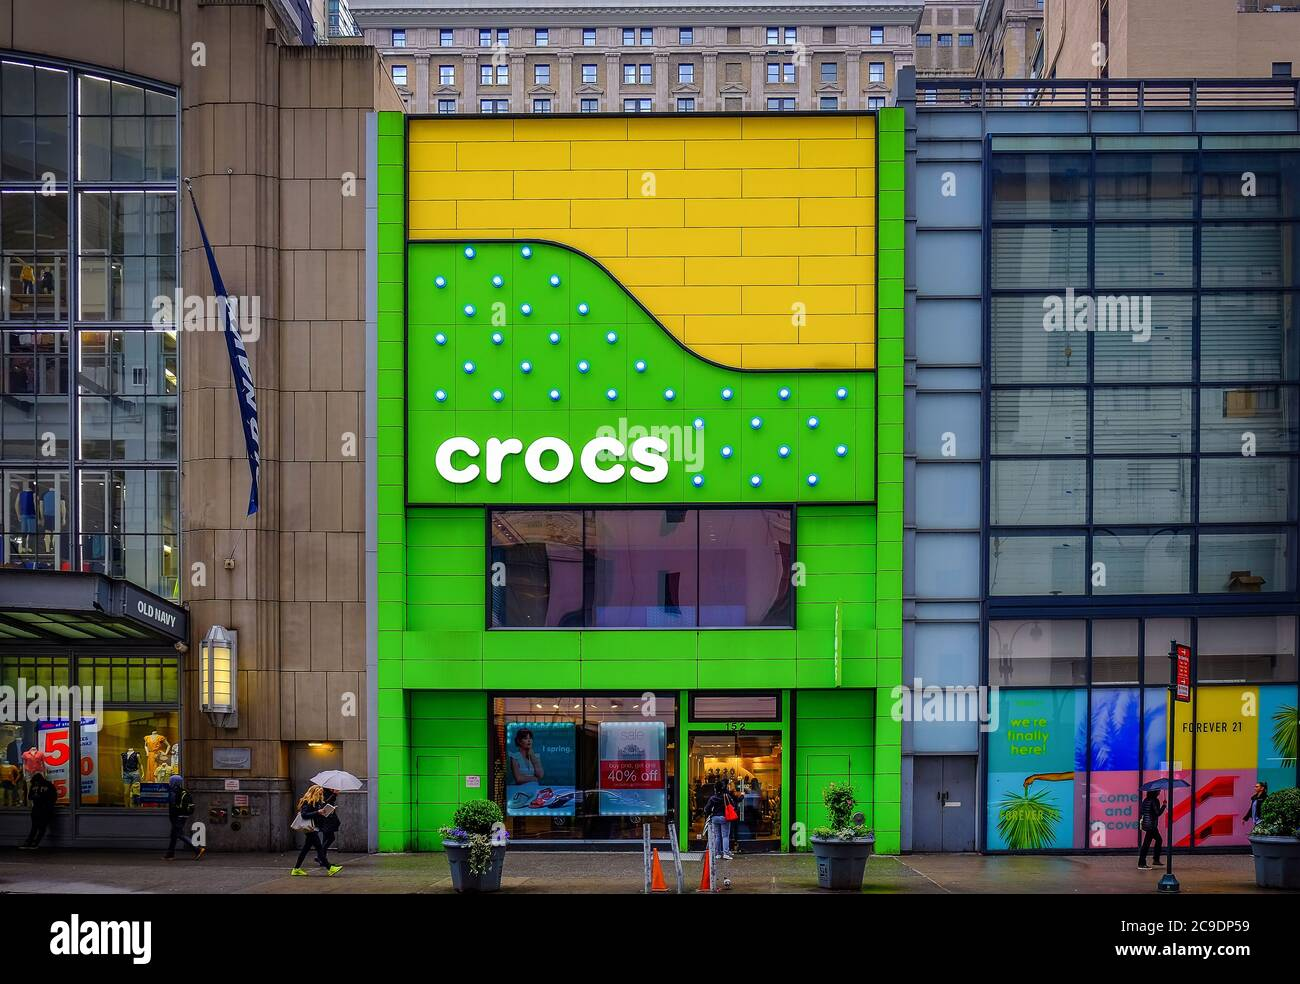 Crocs High Resolution Stock Photography